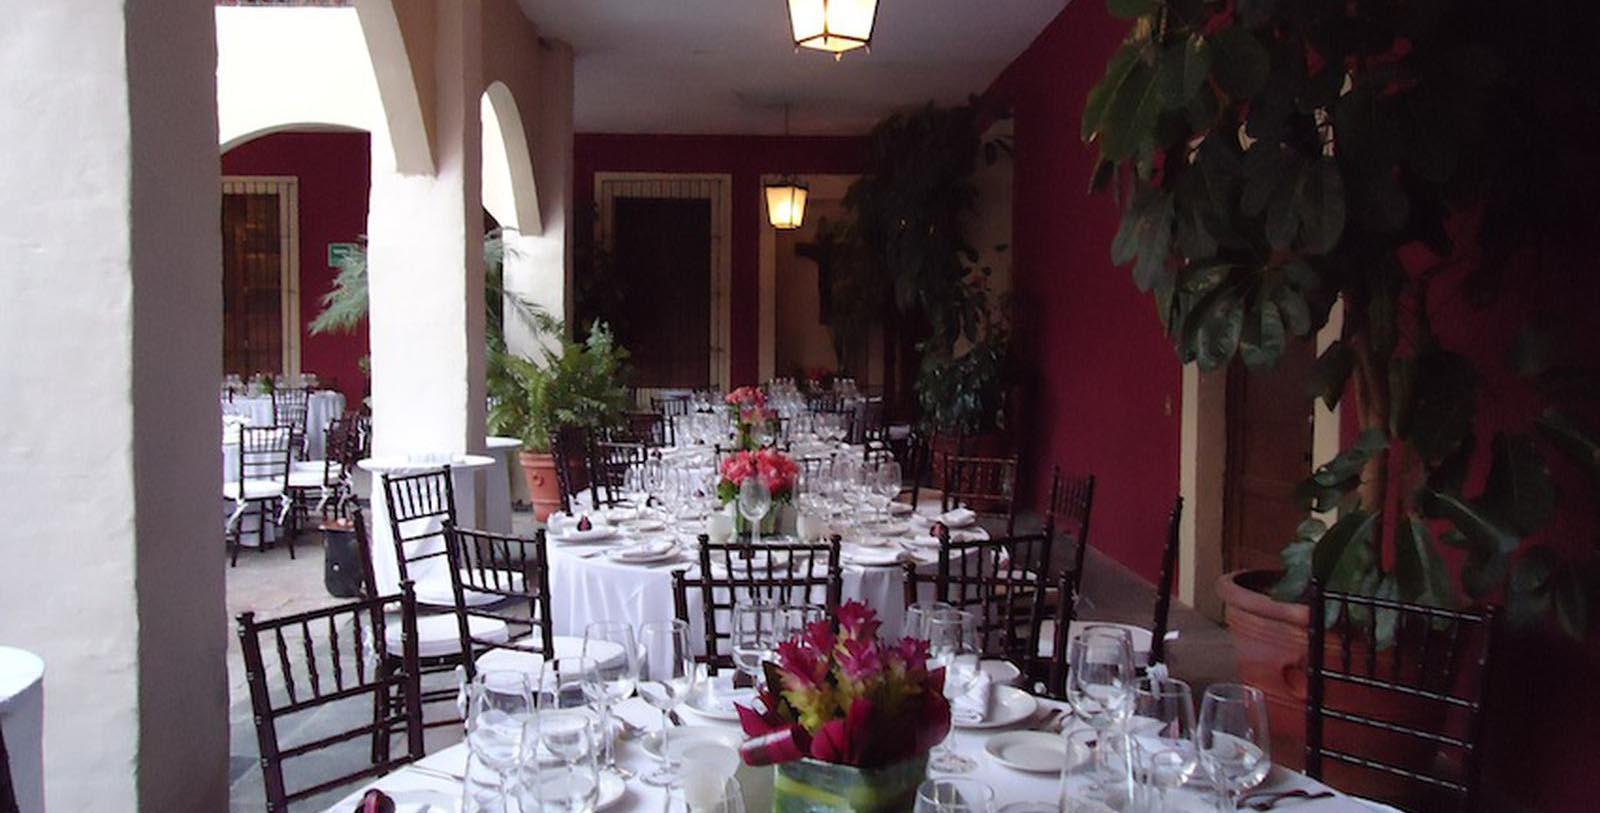 Image of Licorería Xalisco Restaurant, Hotel Gran Casa Xalisco, Guadalajara, Mexico, 1894, Member of Historic Hotels Worldwide, Taste